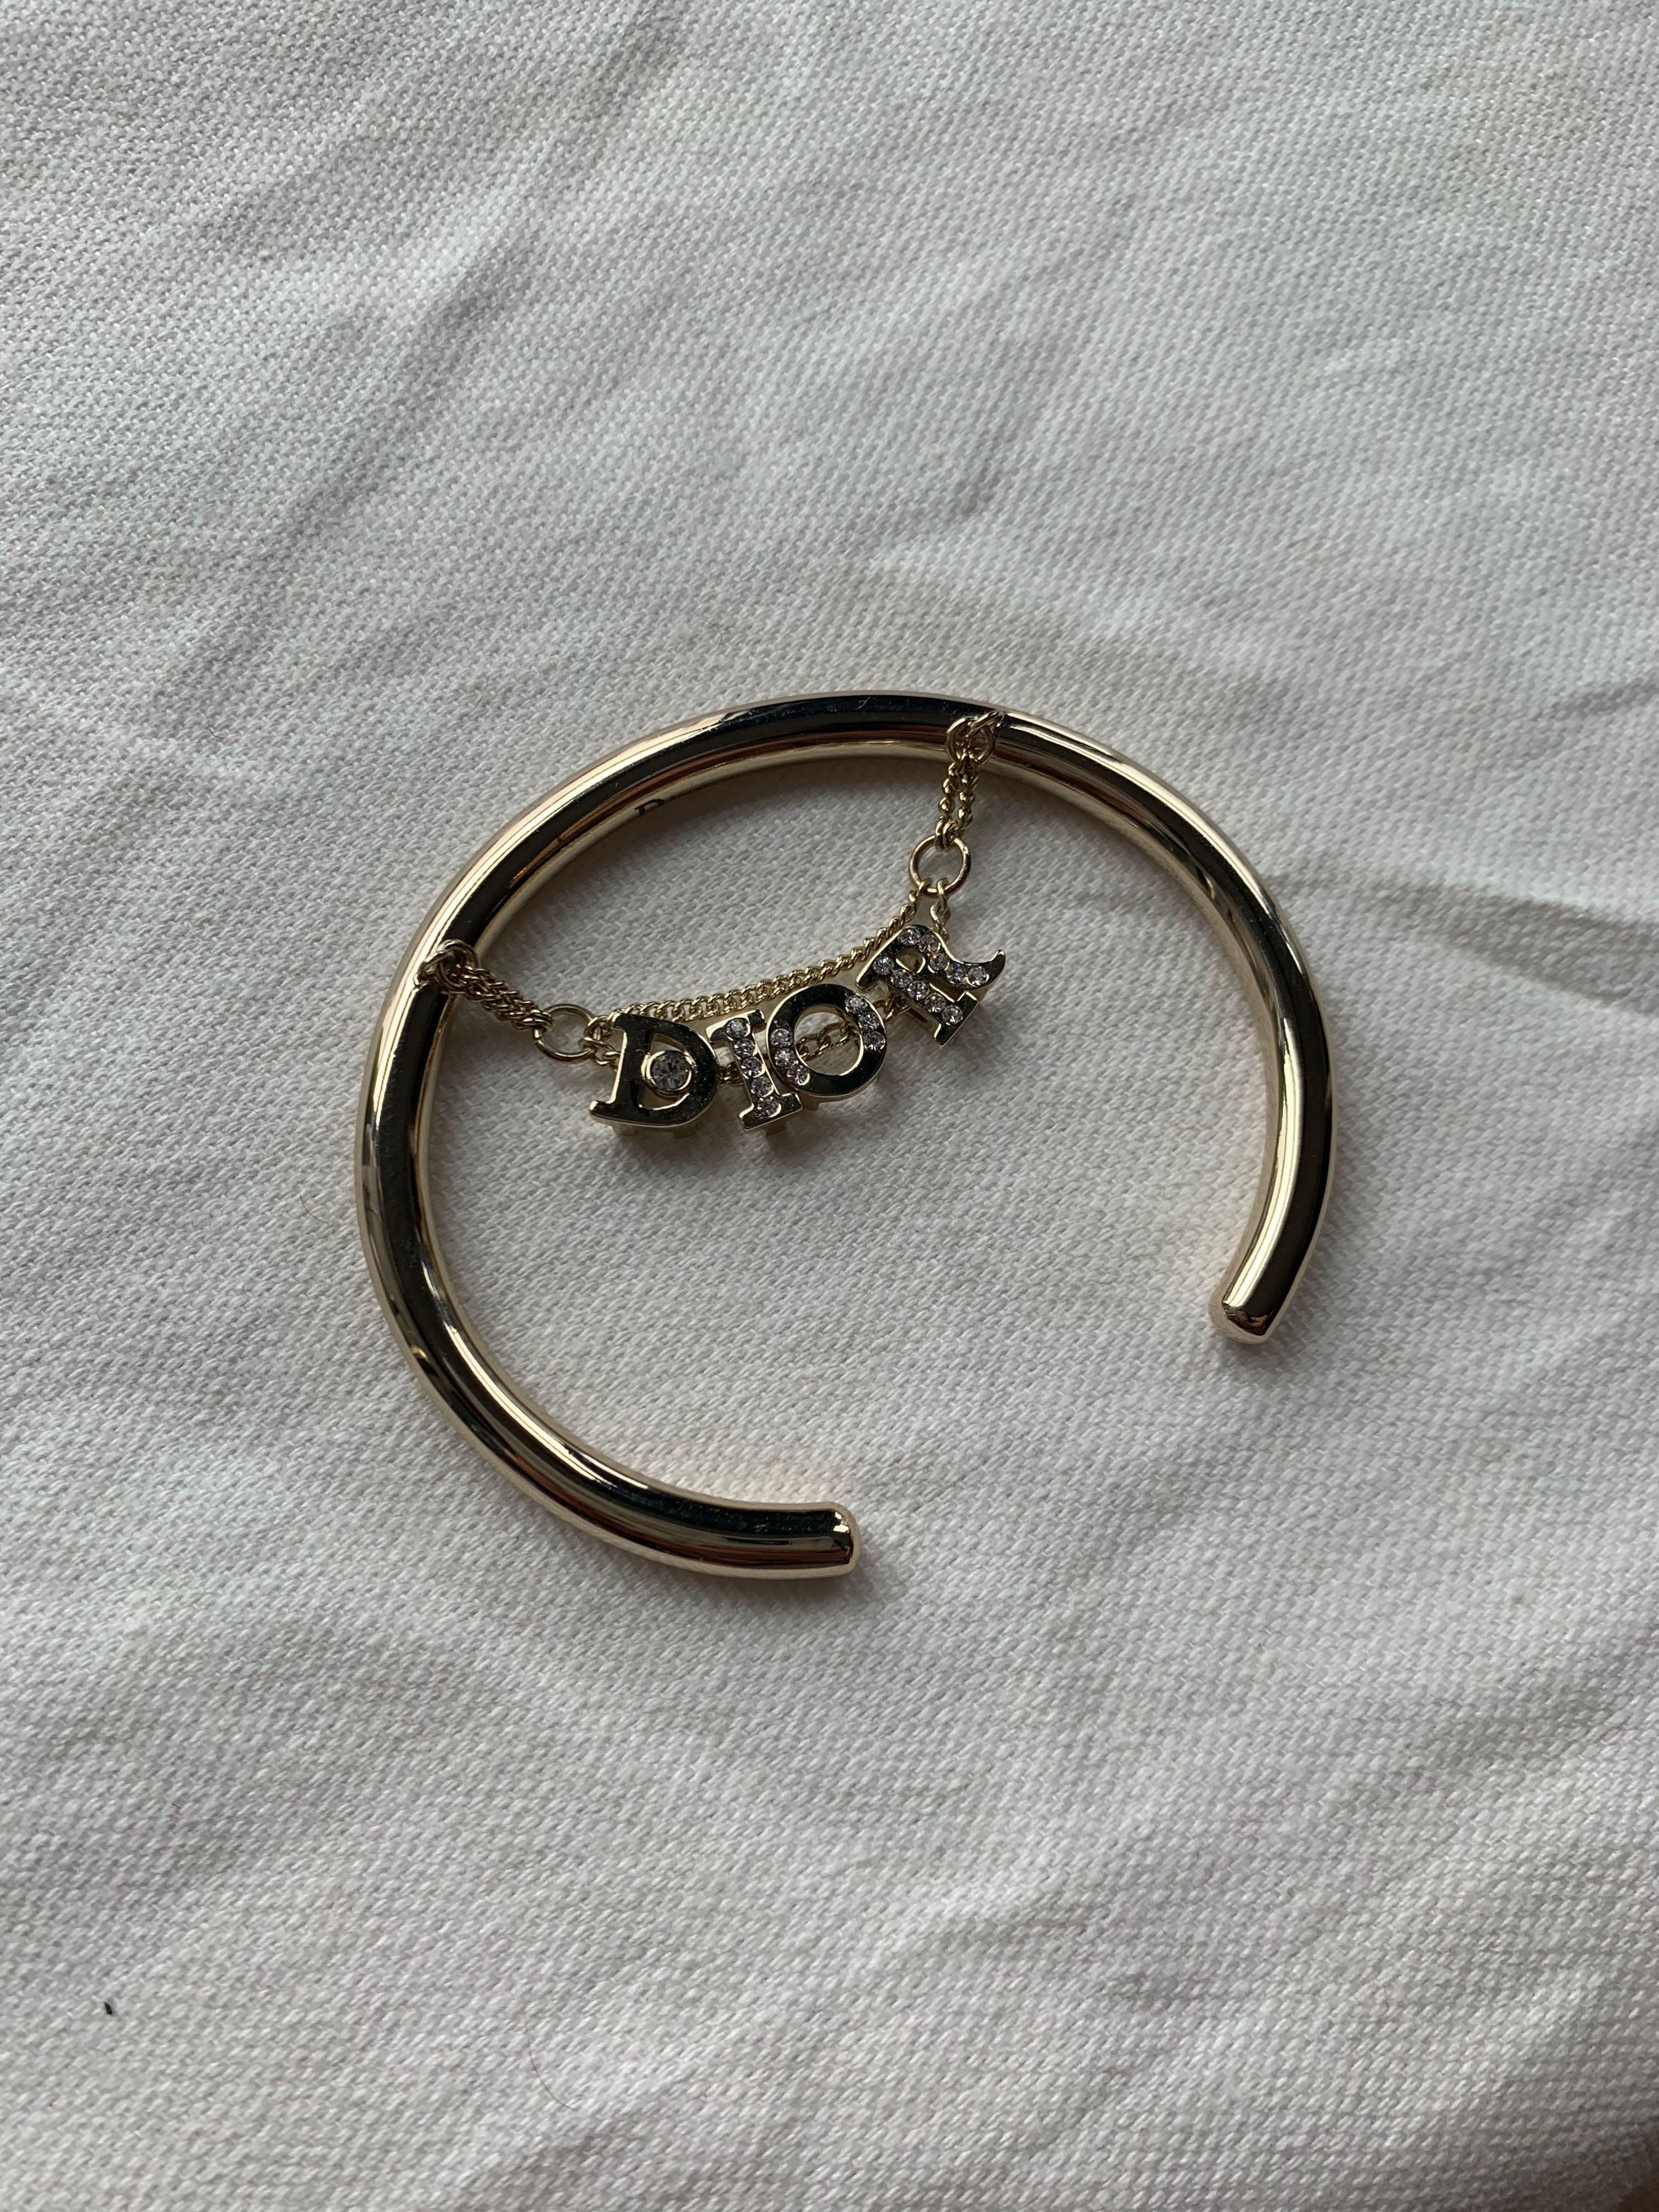 Dior Logo Cuff Bangle Bracelet